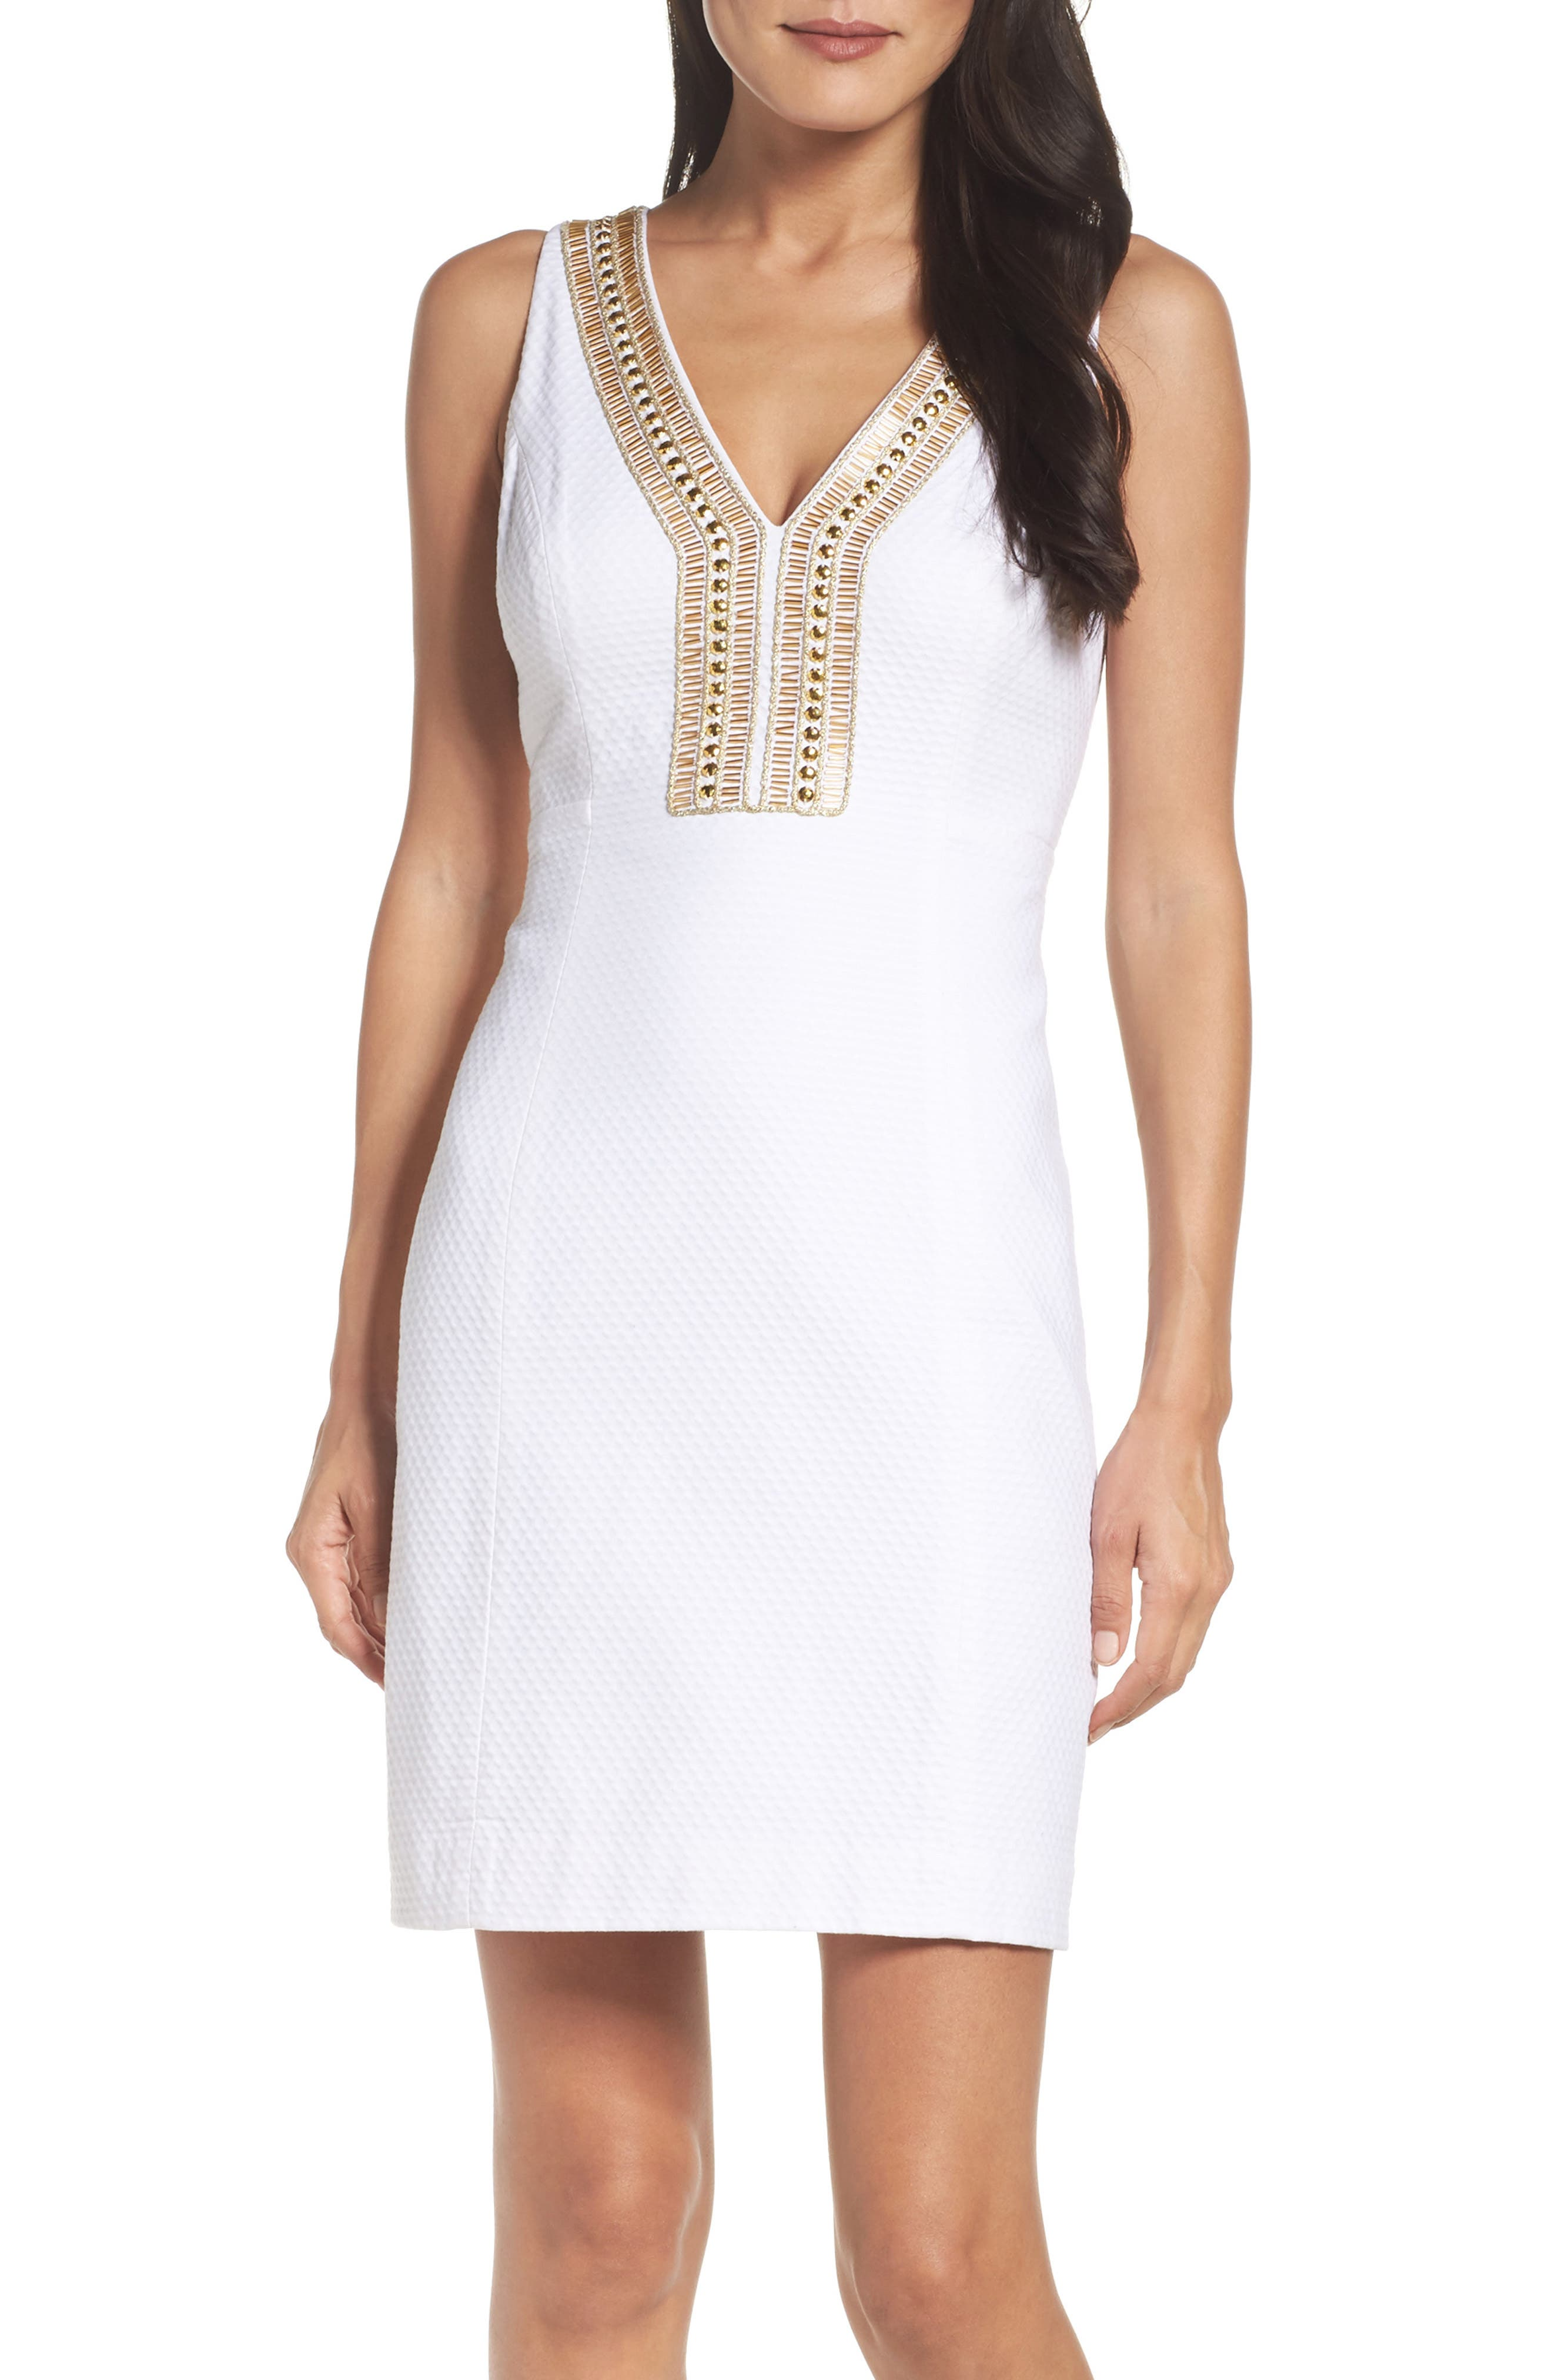 Lilly Pulitzer® Eliot Embellished Shift Dress